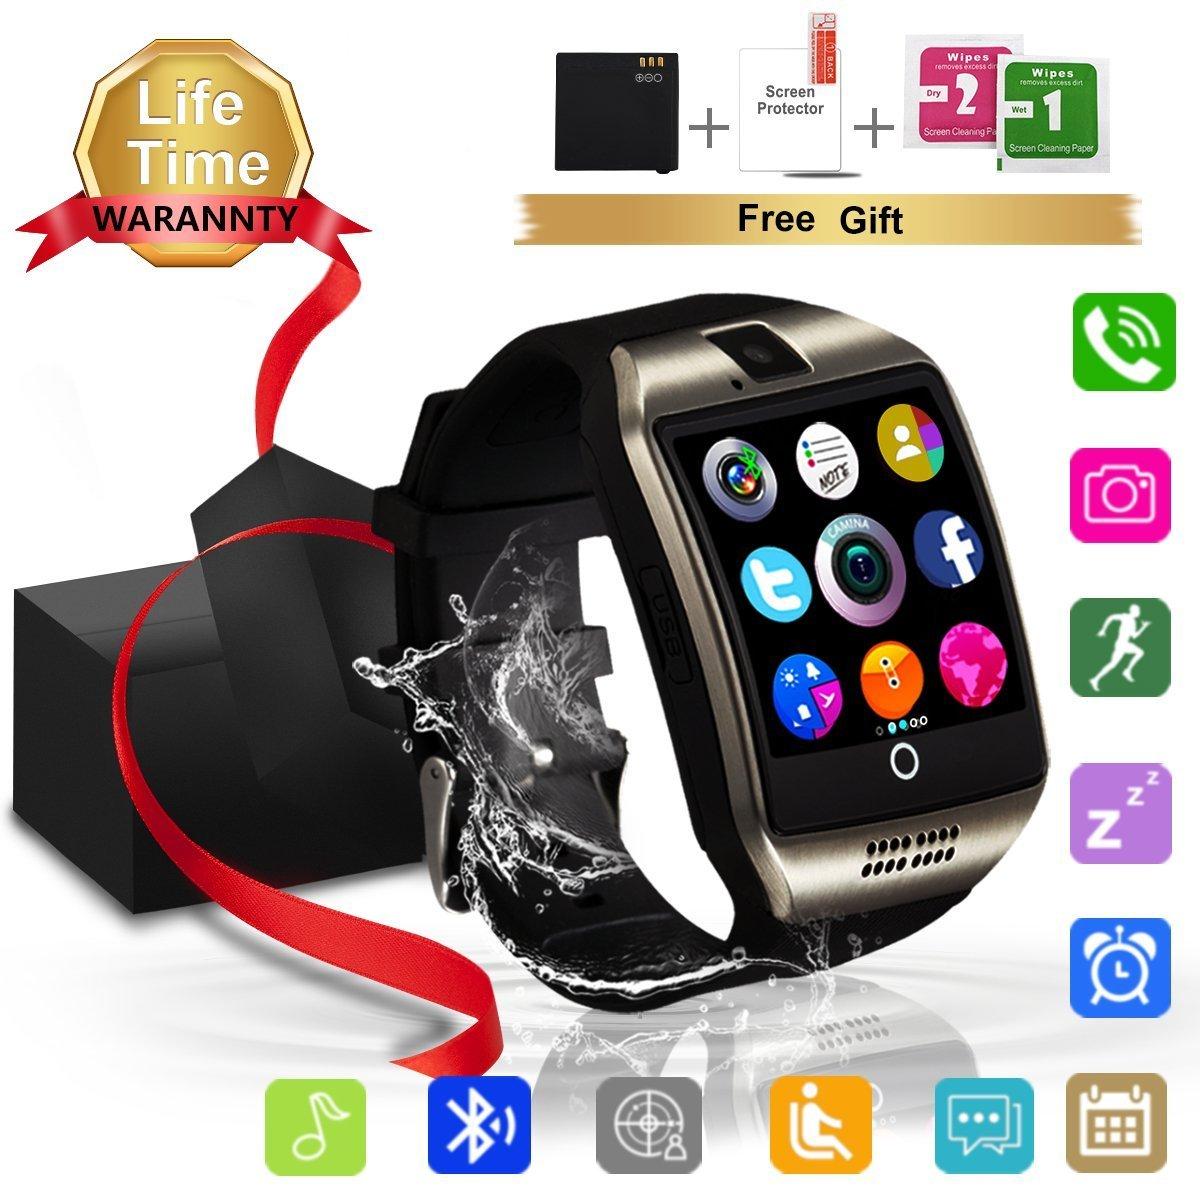 Reloj Inteligente Bluetooth - Kindak: Amazon.es: Electrónica